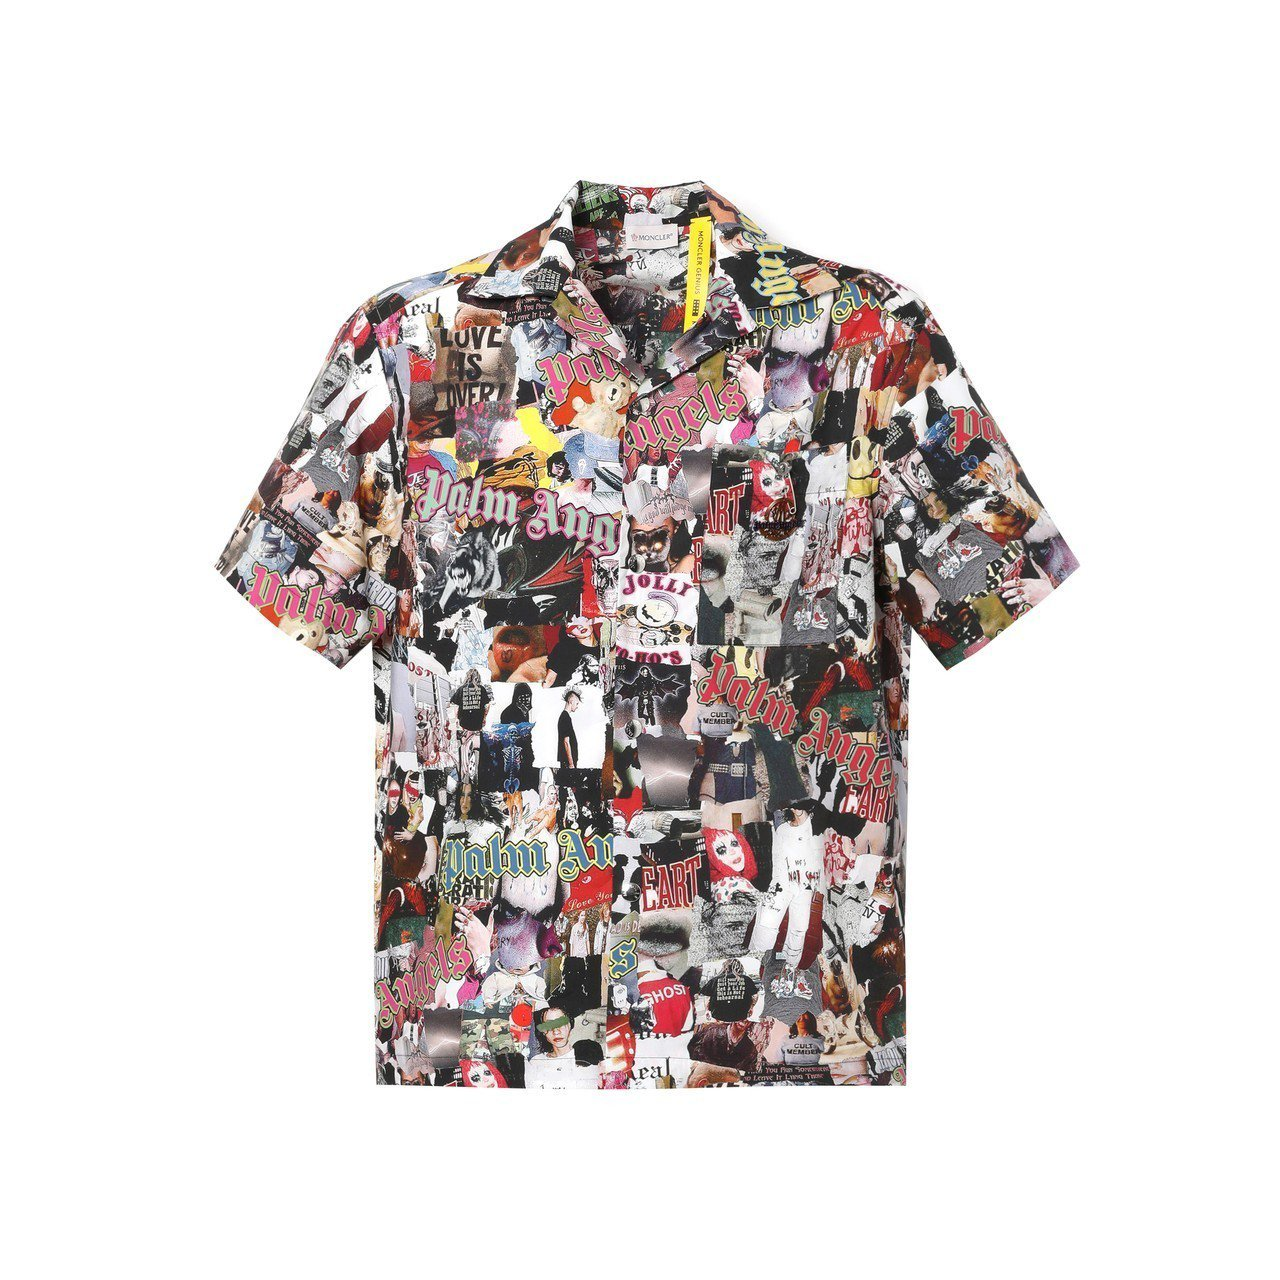 Camica襯衫,售價23,000元。圖/MONCLER提供